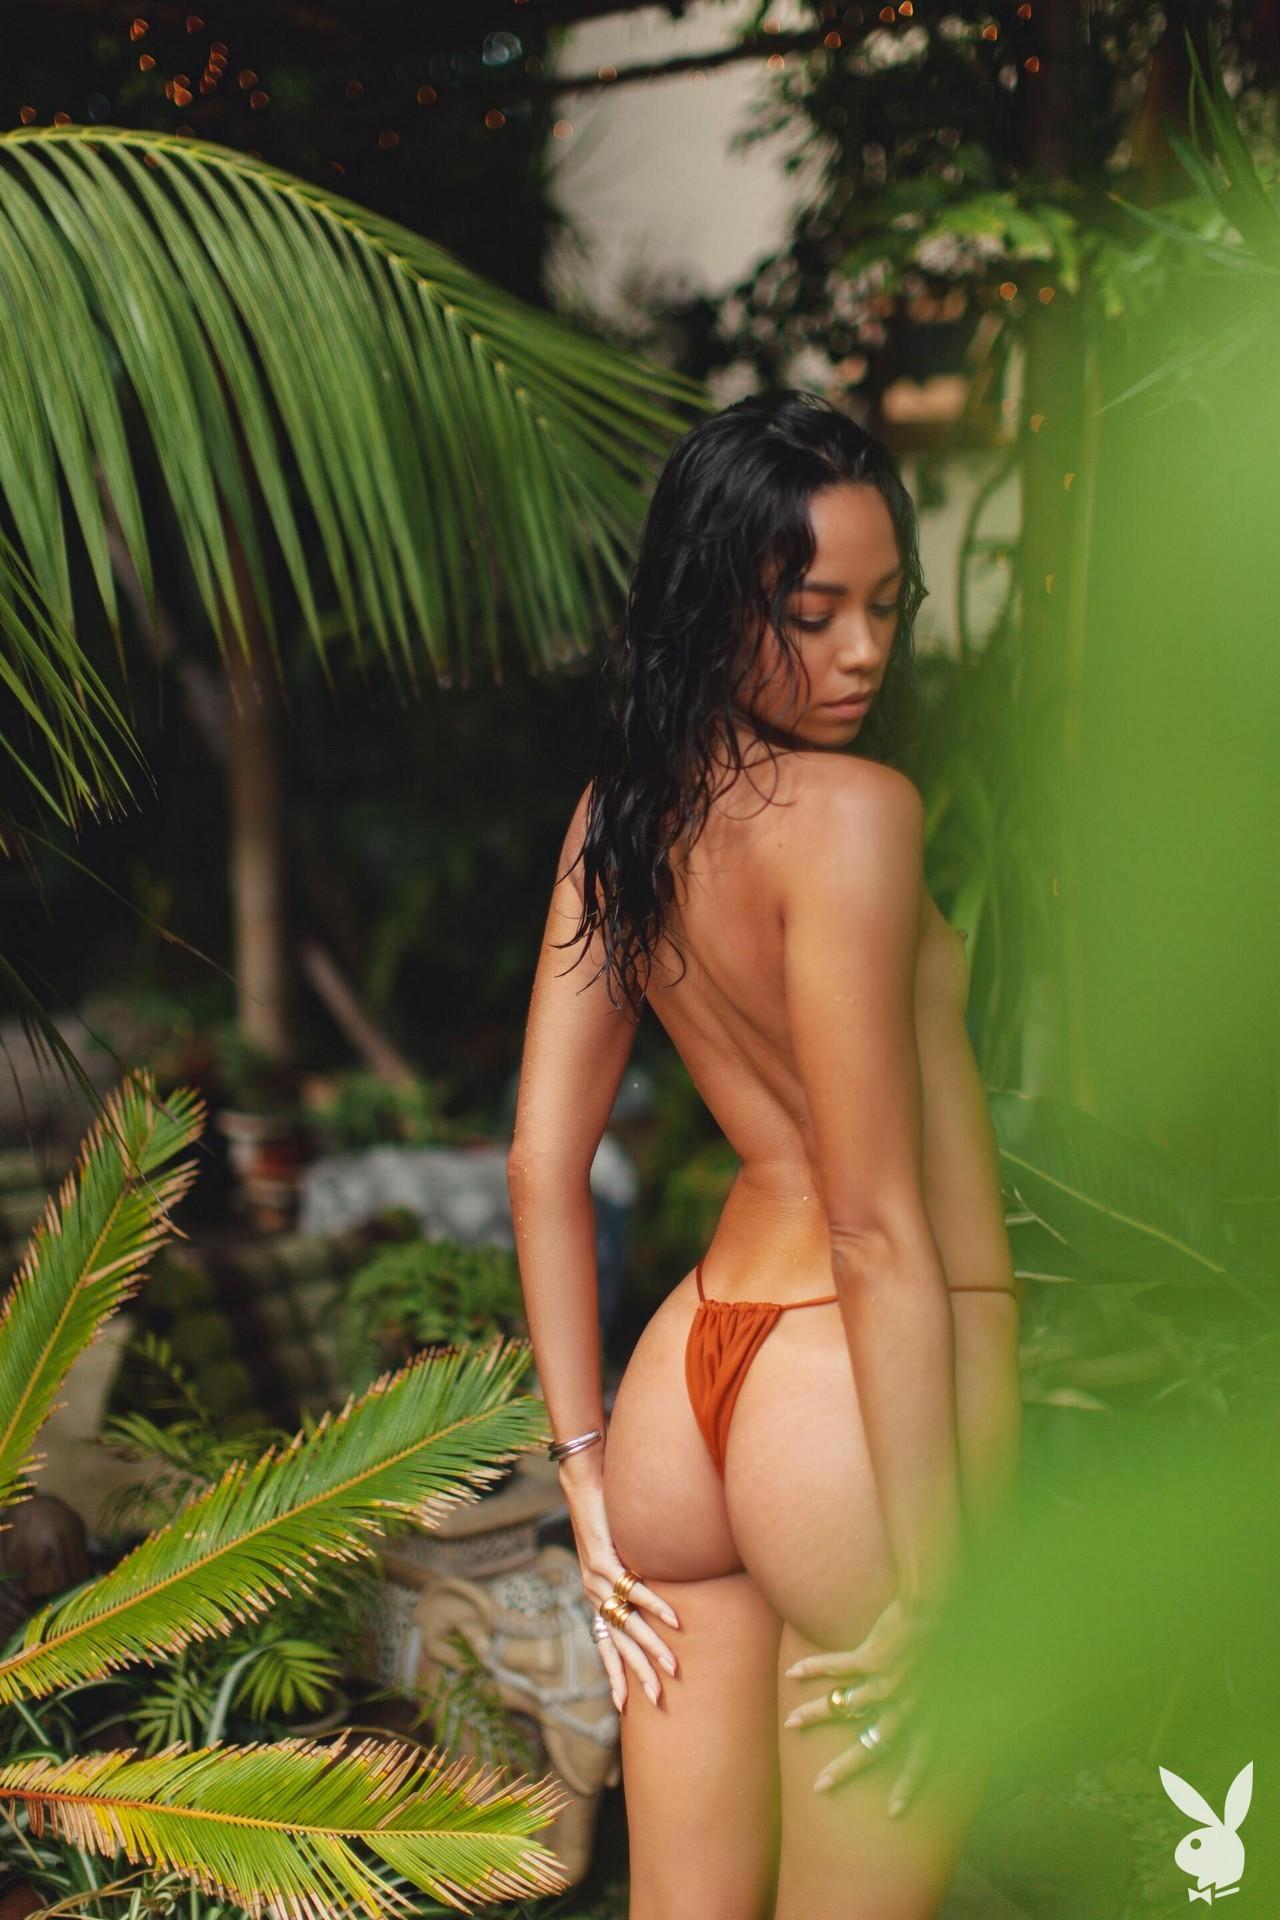 Playmate September 2020 Danielle Alcaraz Playboy Plus (49)